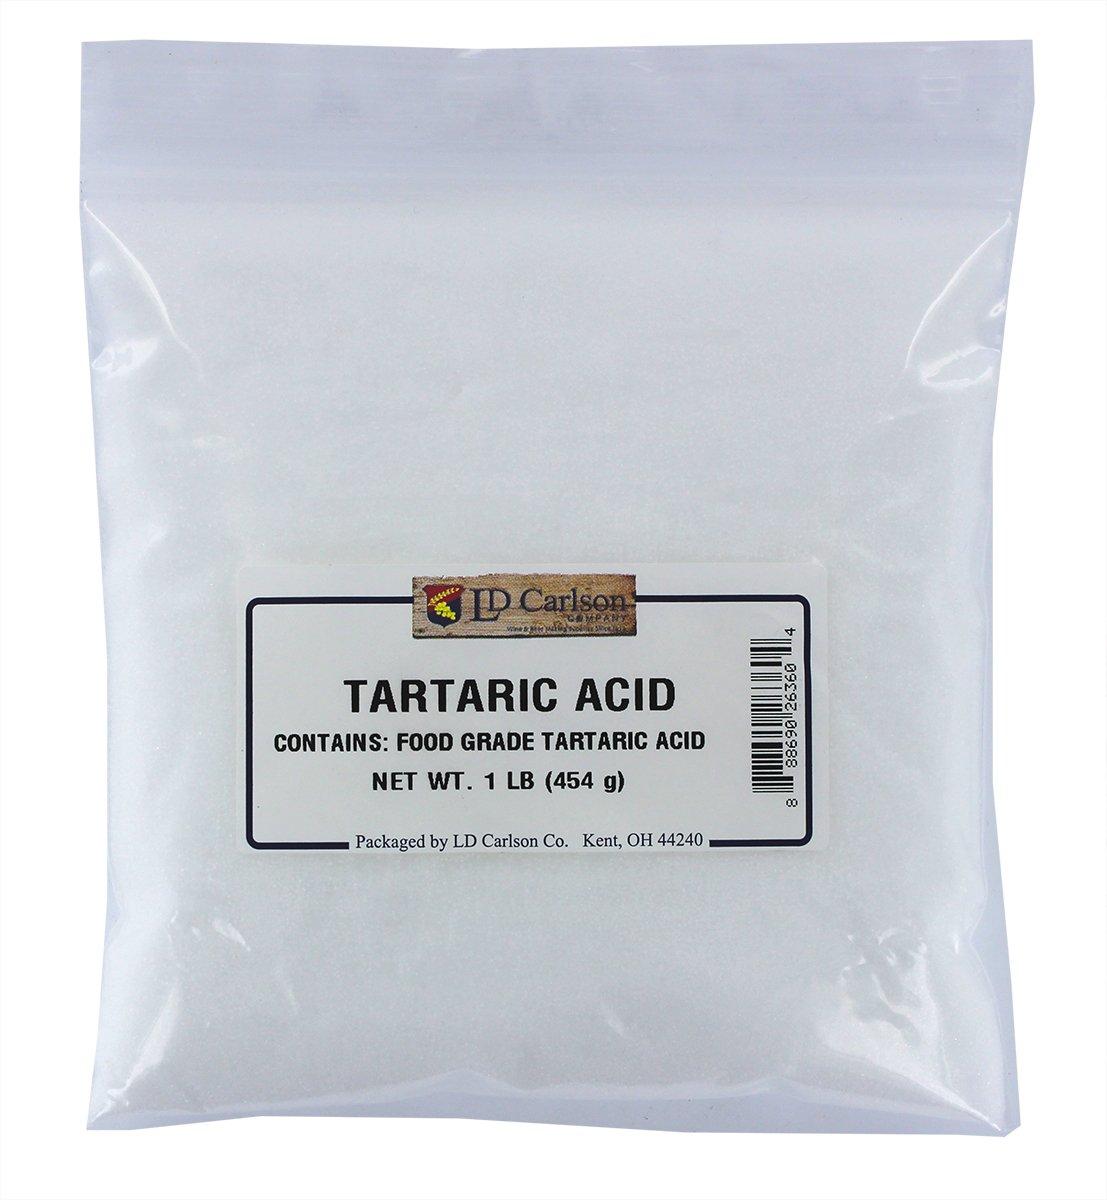 LD Carlson - Tartaric Acid - 1 lb